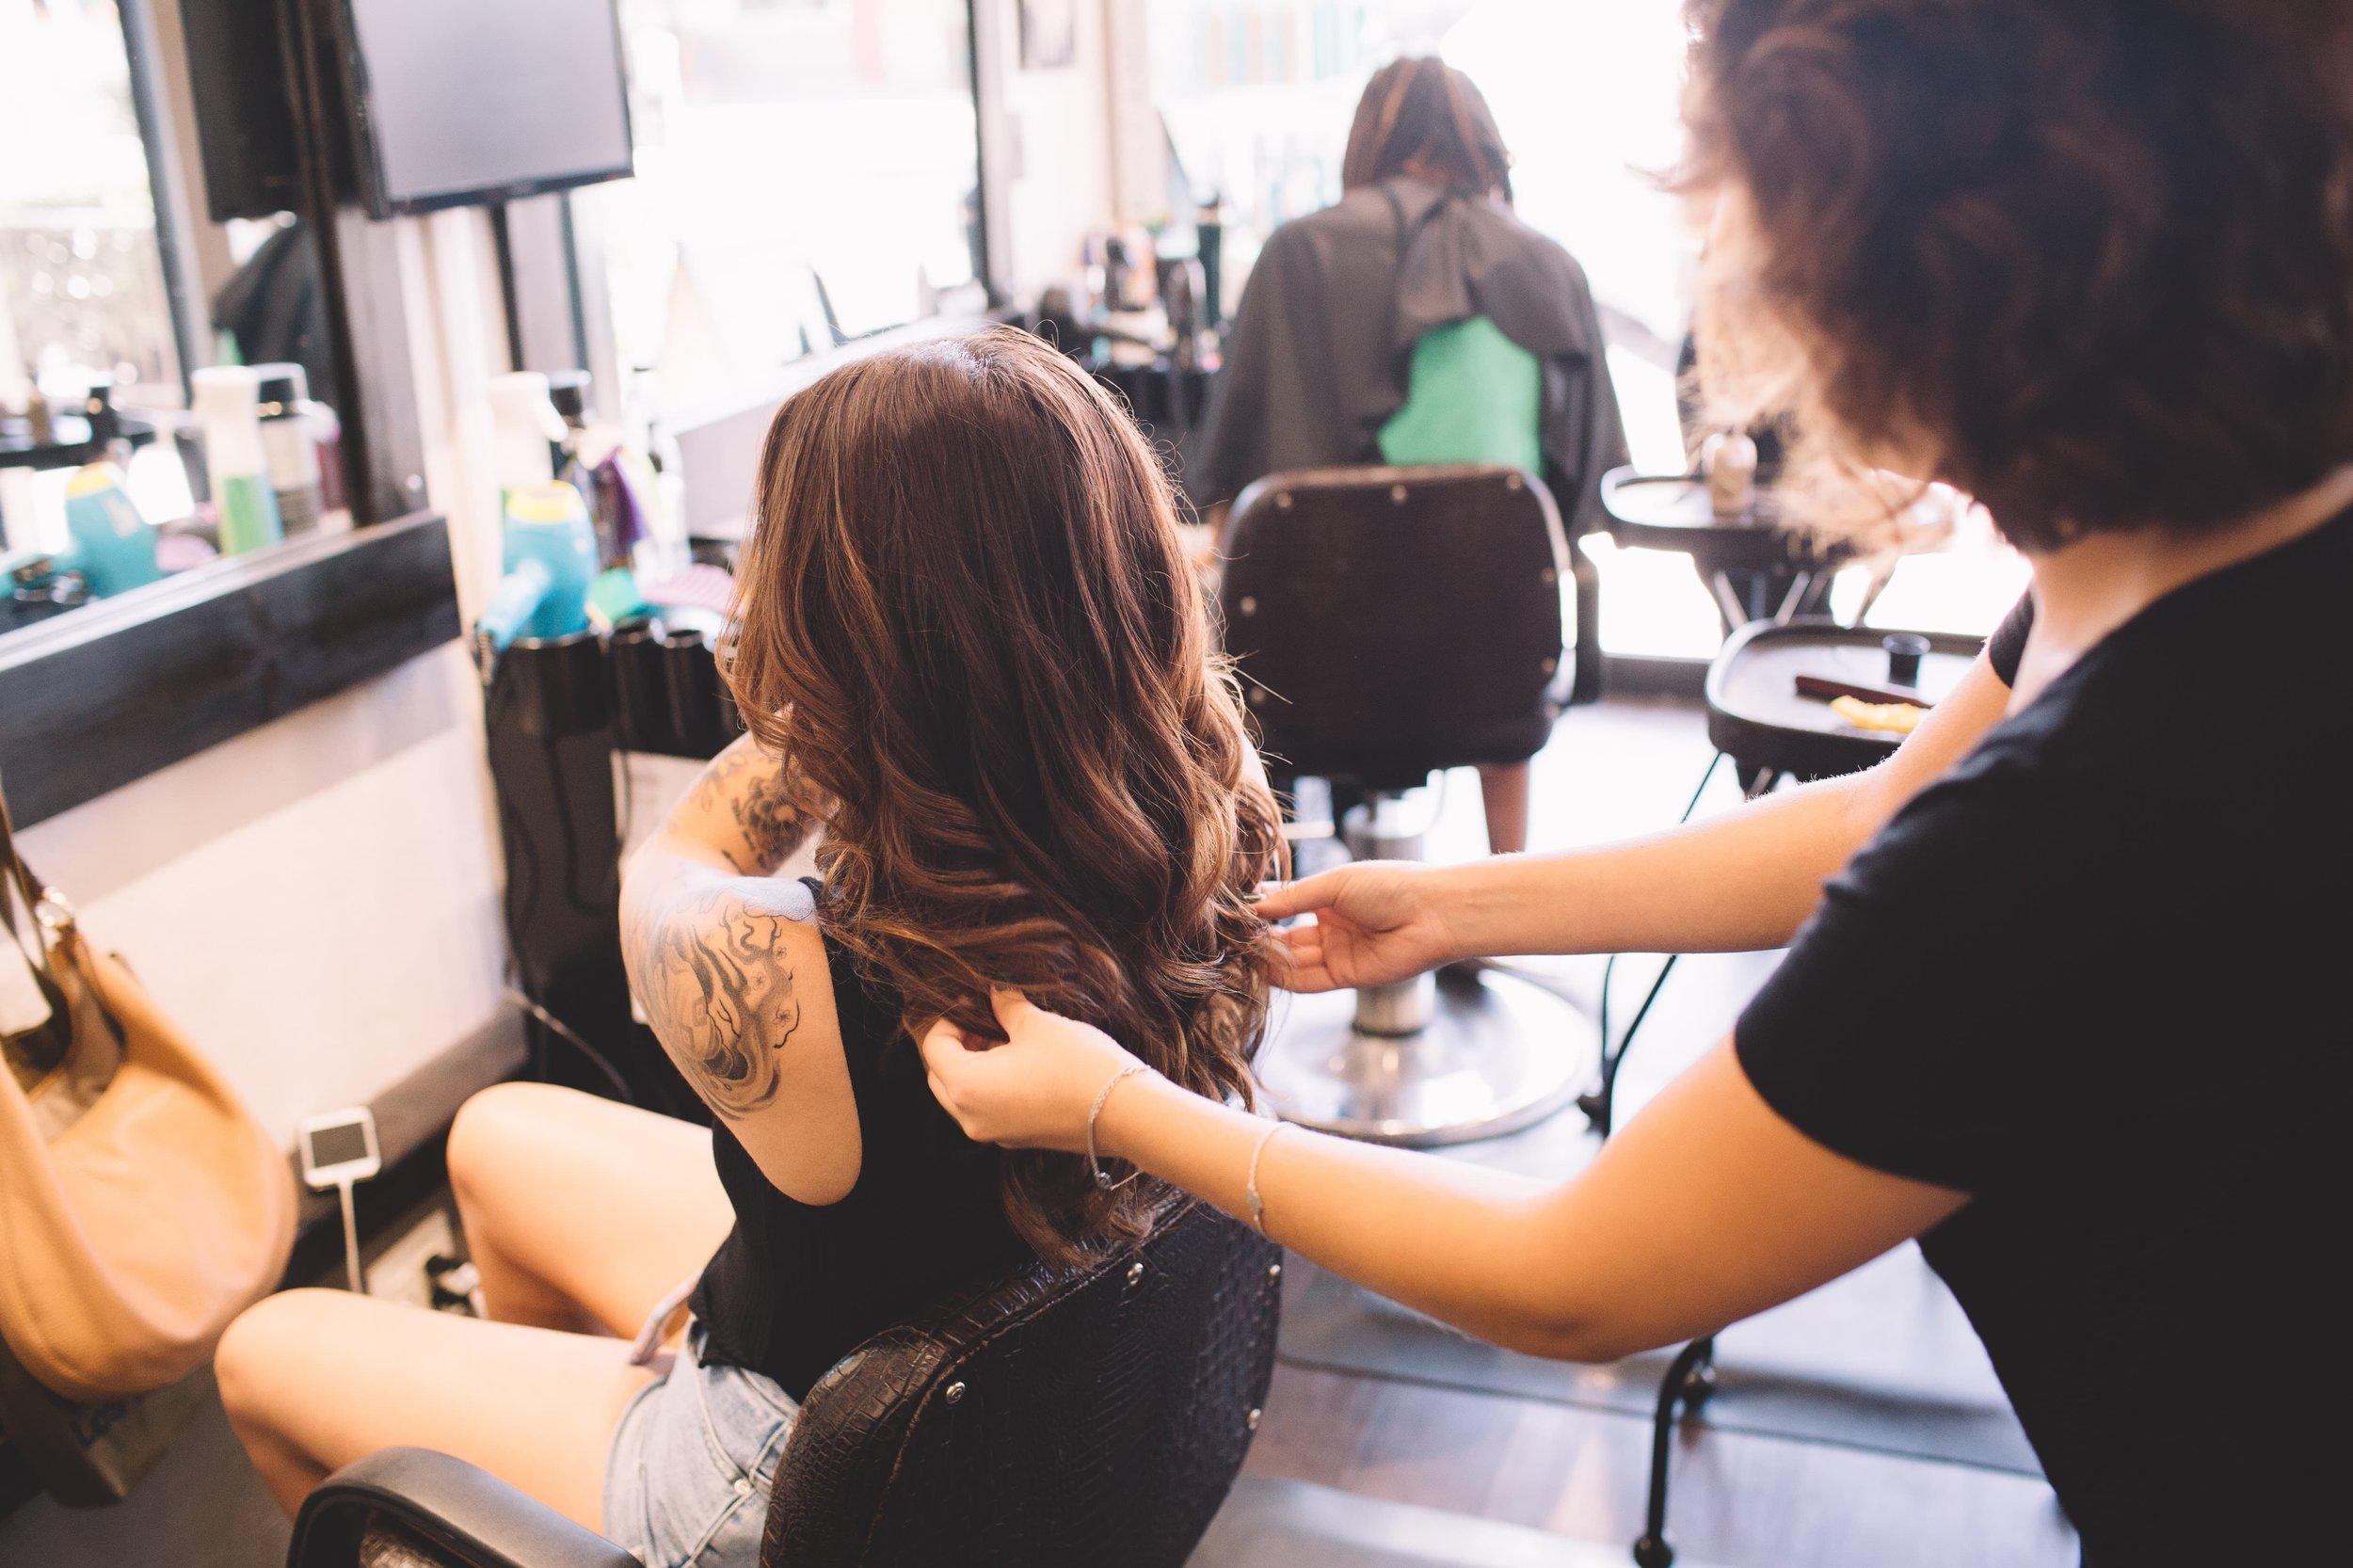 girl-with-long-brown-hair-at-salon